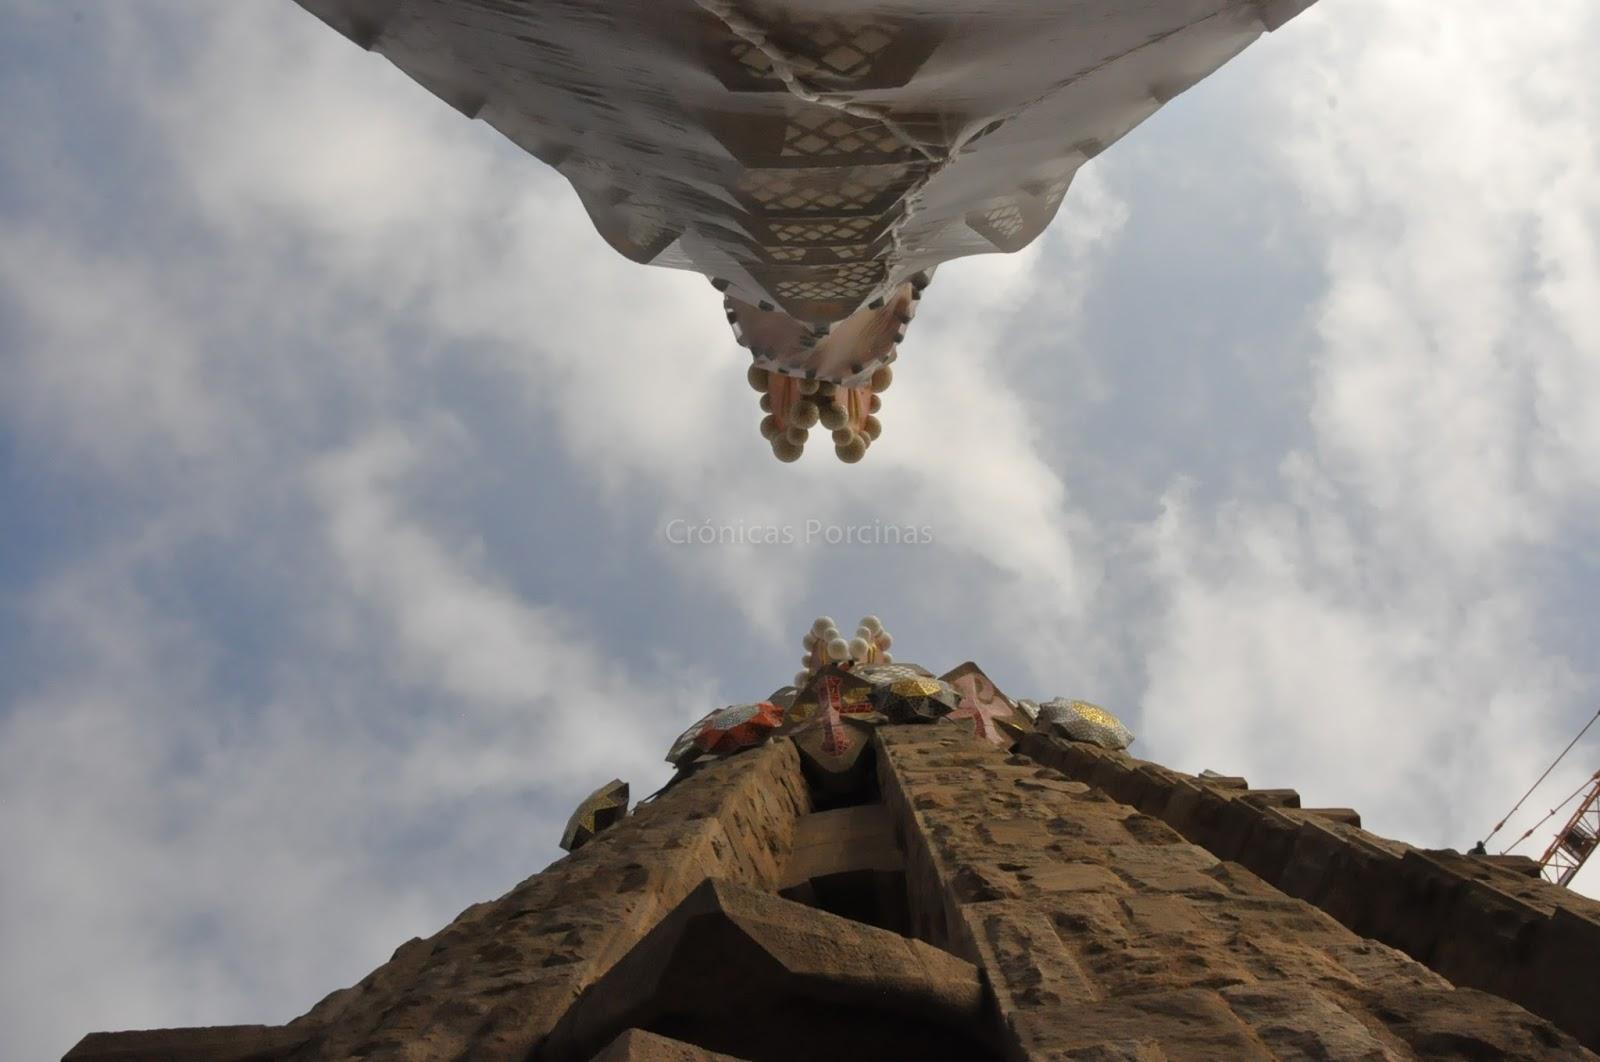 Visita a la Sagrada Familia en Barcelona